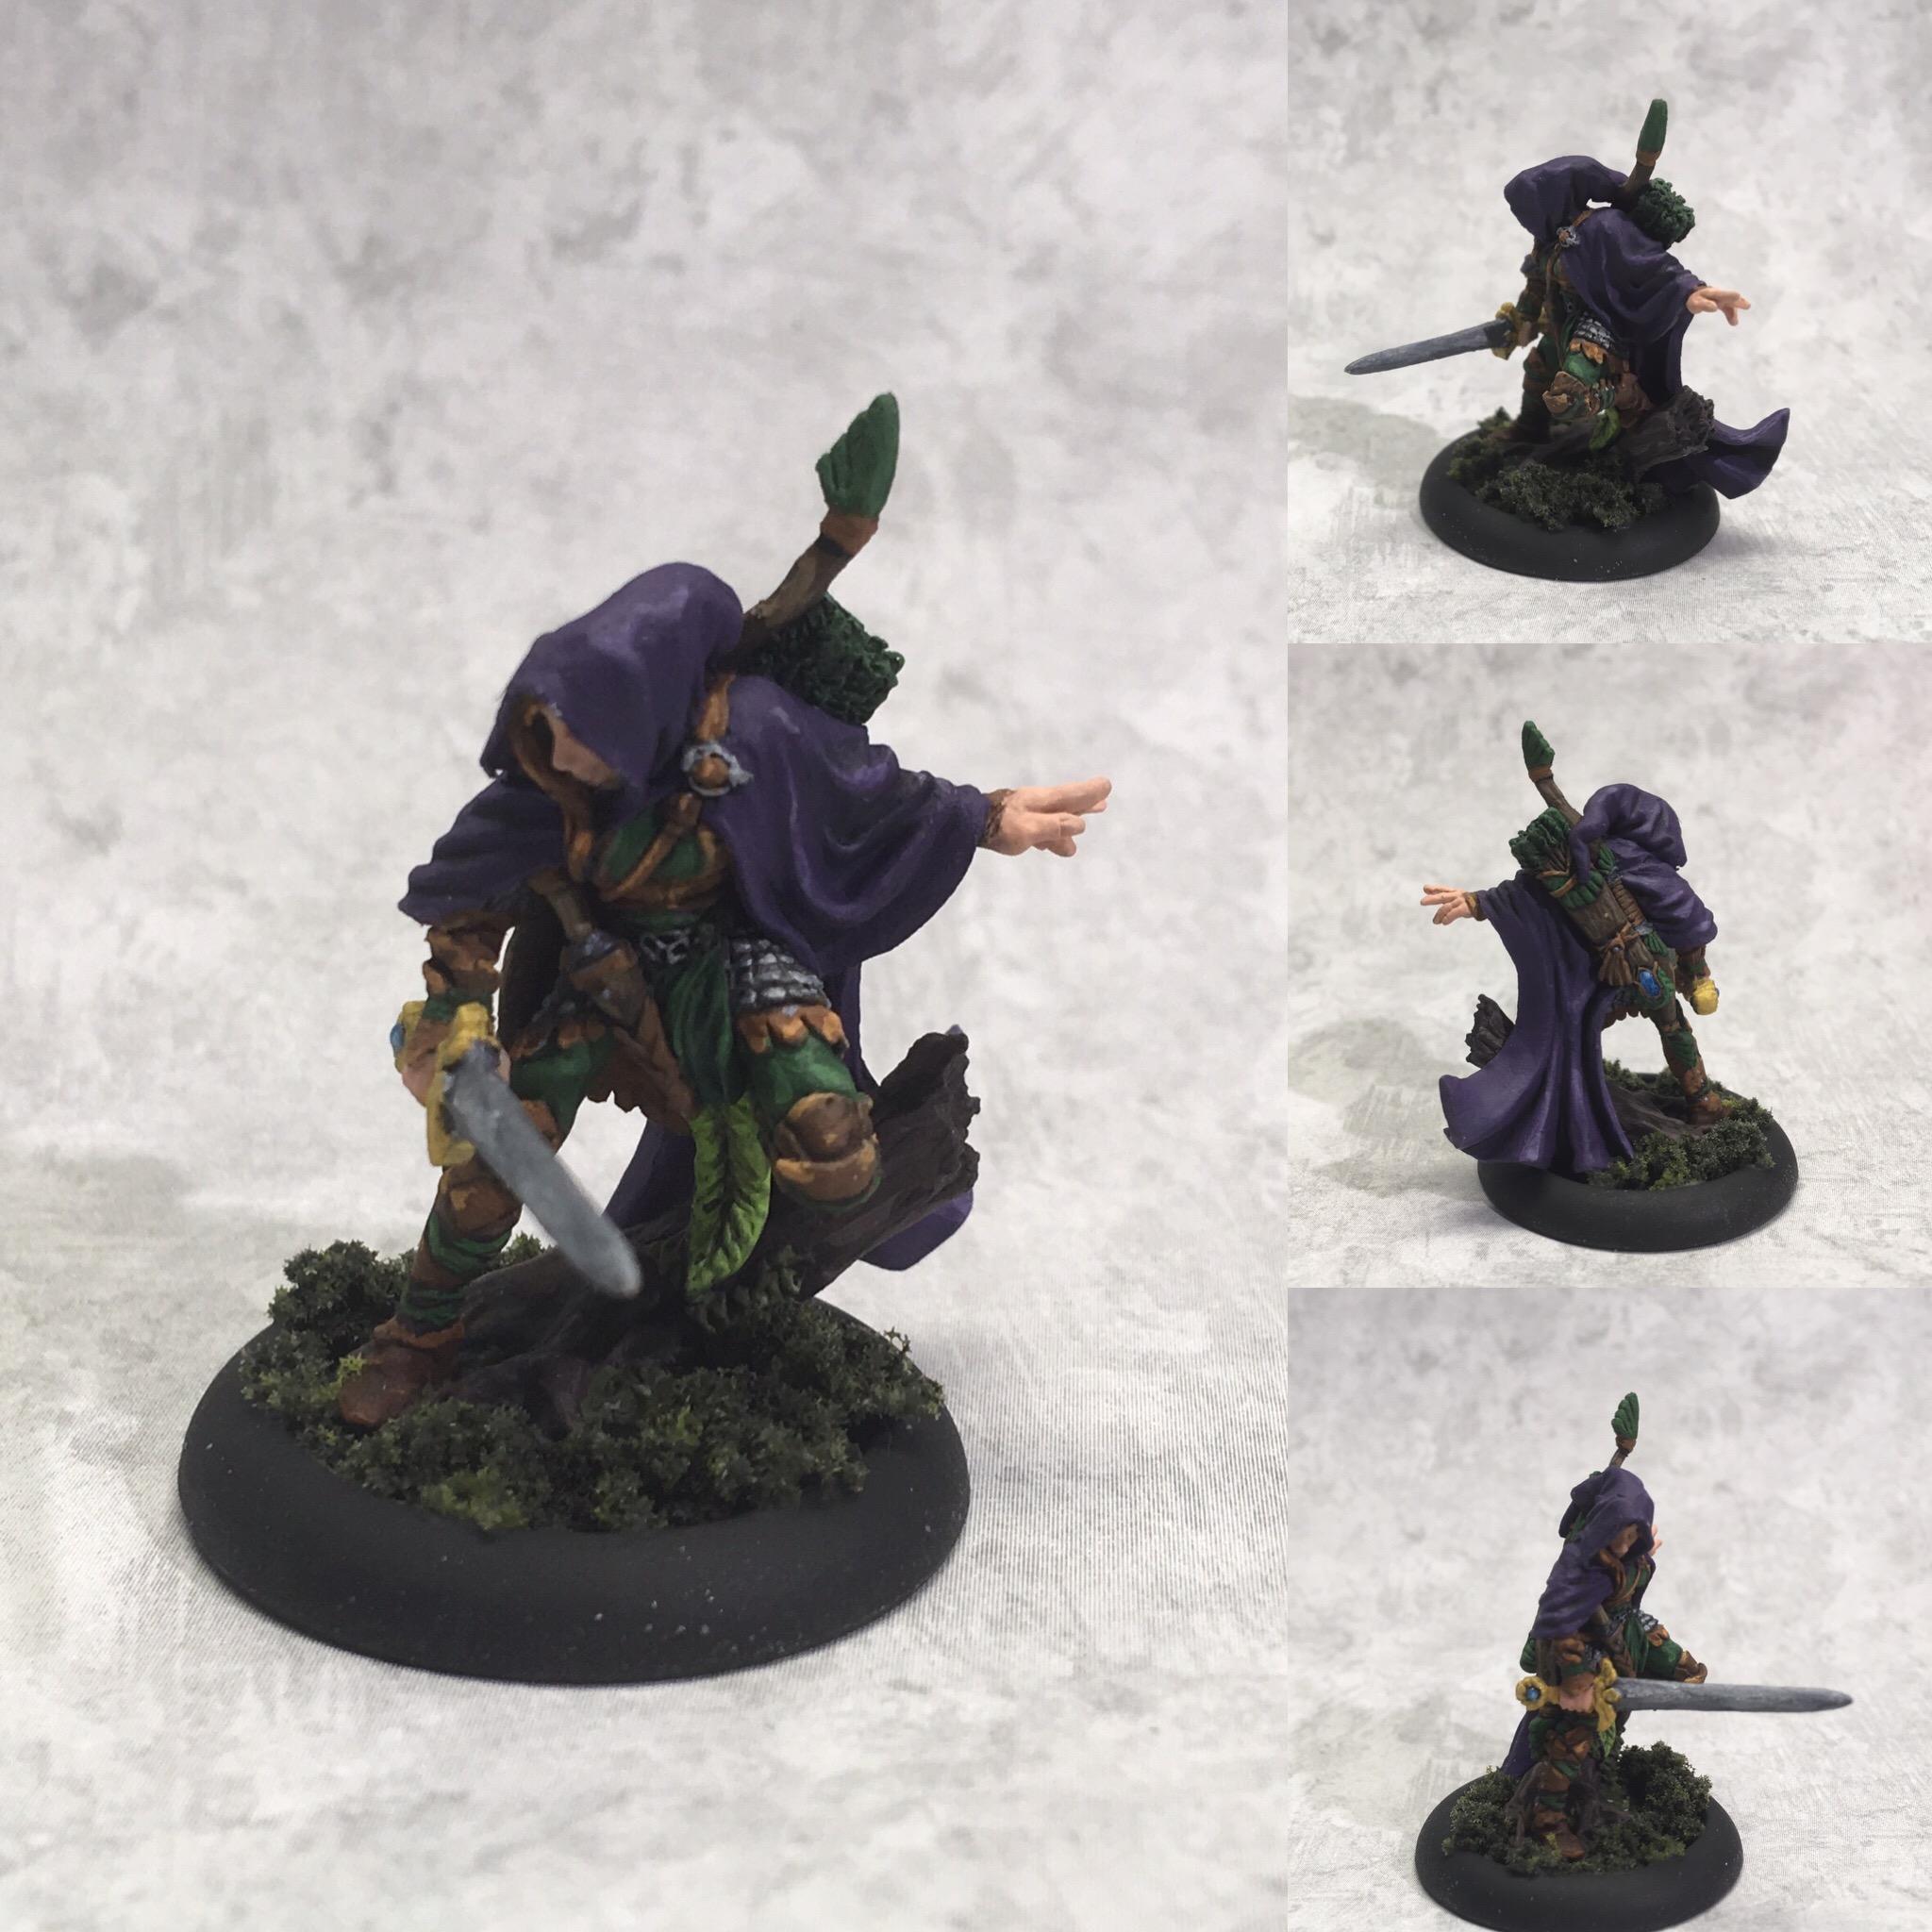 Nienna, Female Elf Ranger